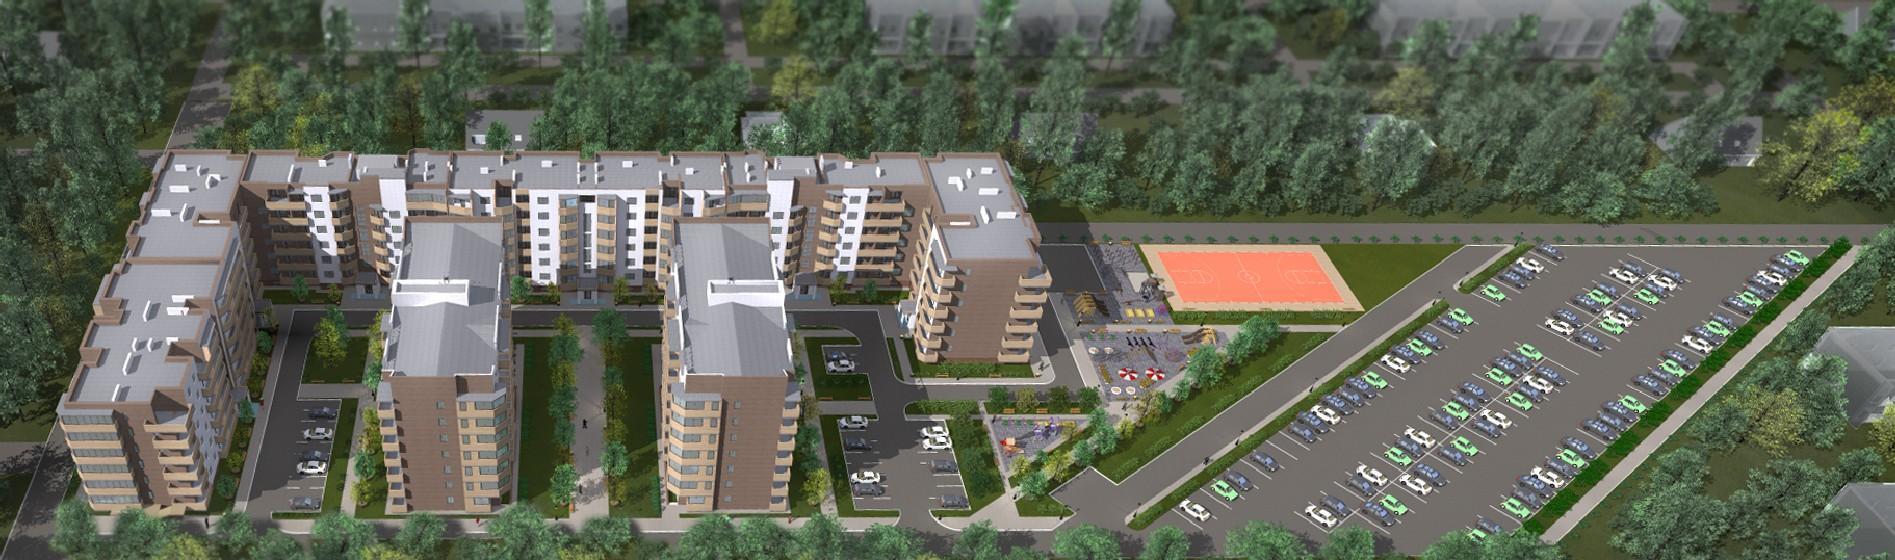 ЖСК Новый Квартал Краснодар | фото - 1